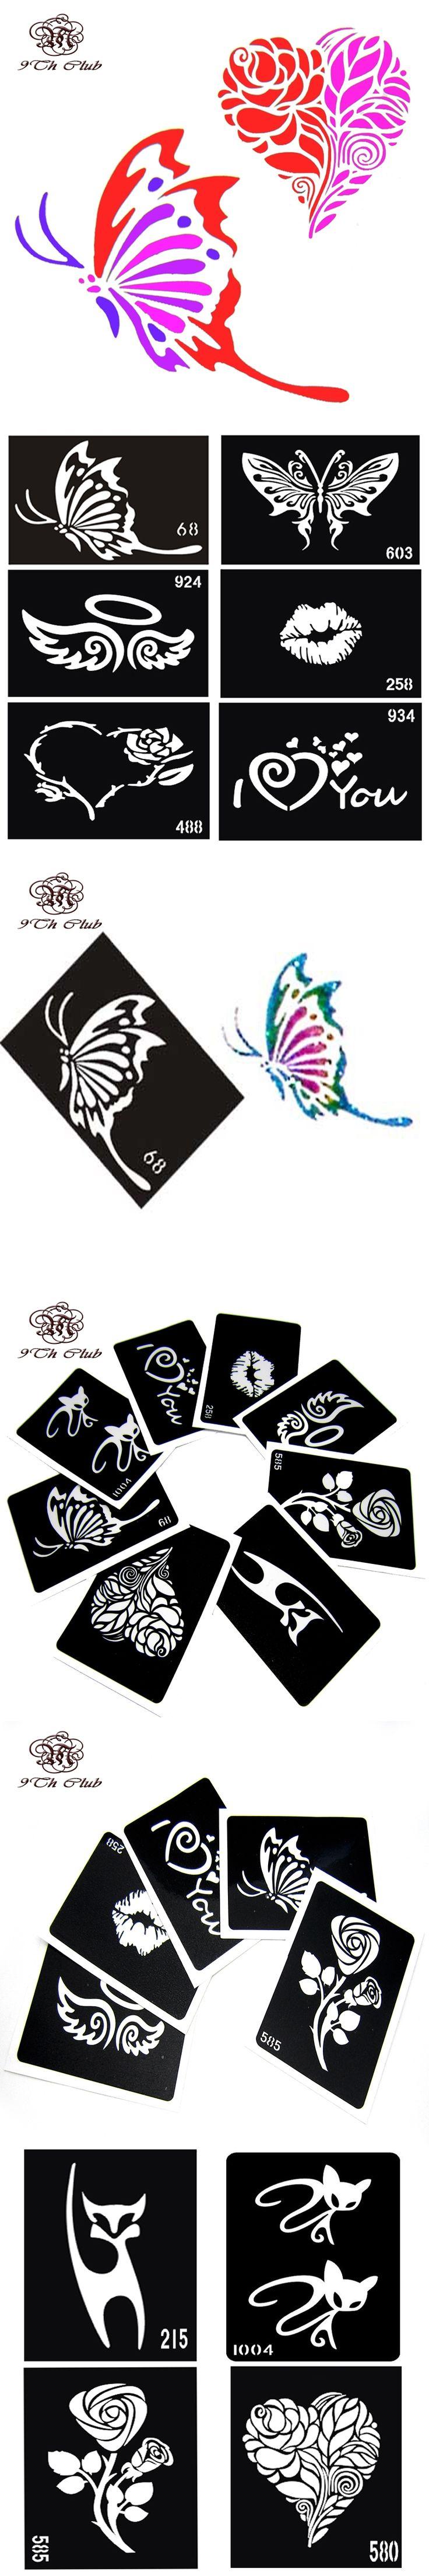 Air brush Glitter Tattoo Stencil Cat Angel Heart Flower Butterfly Cute Drawing Templates, Woman Female Airbrush Tattoo Stencils